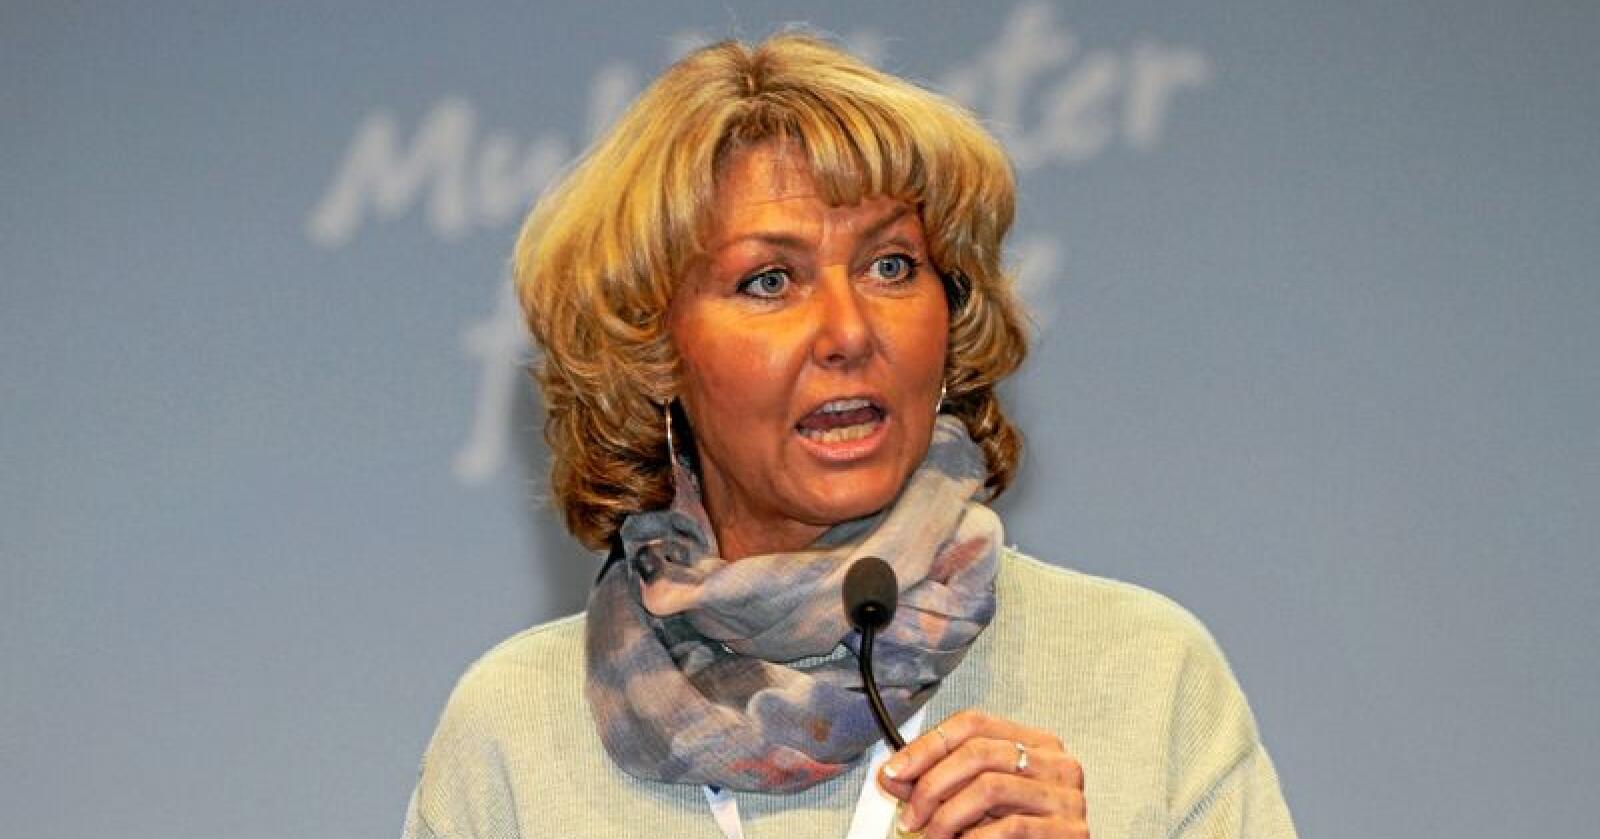 Hanne Alstrup Velure. Foto: Kjetil Ree CC BY-SA 3.0